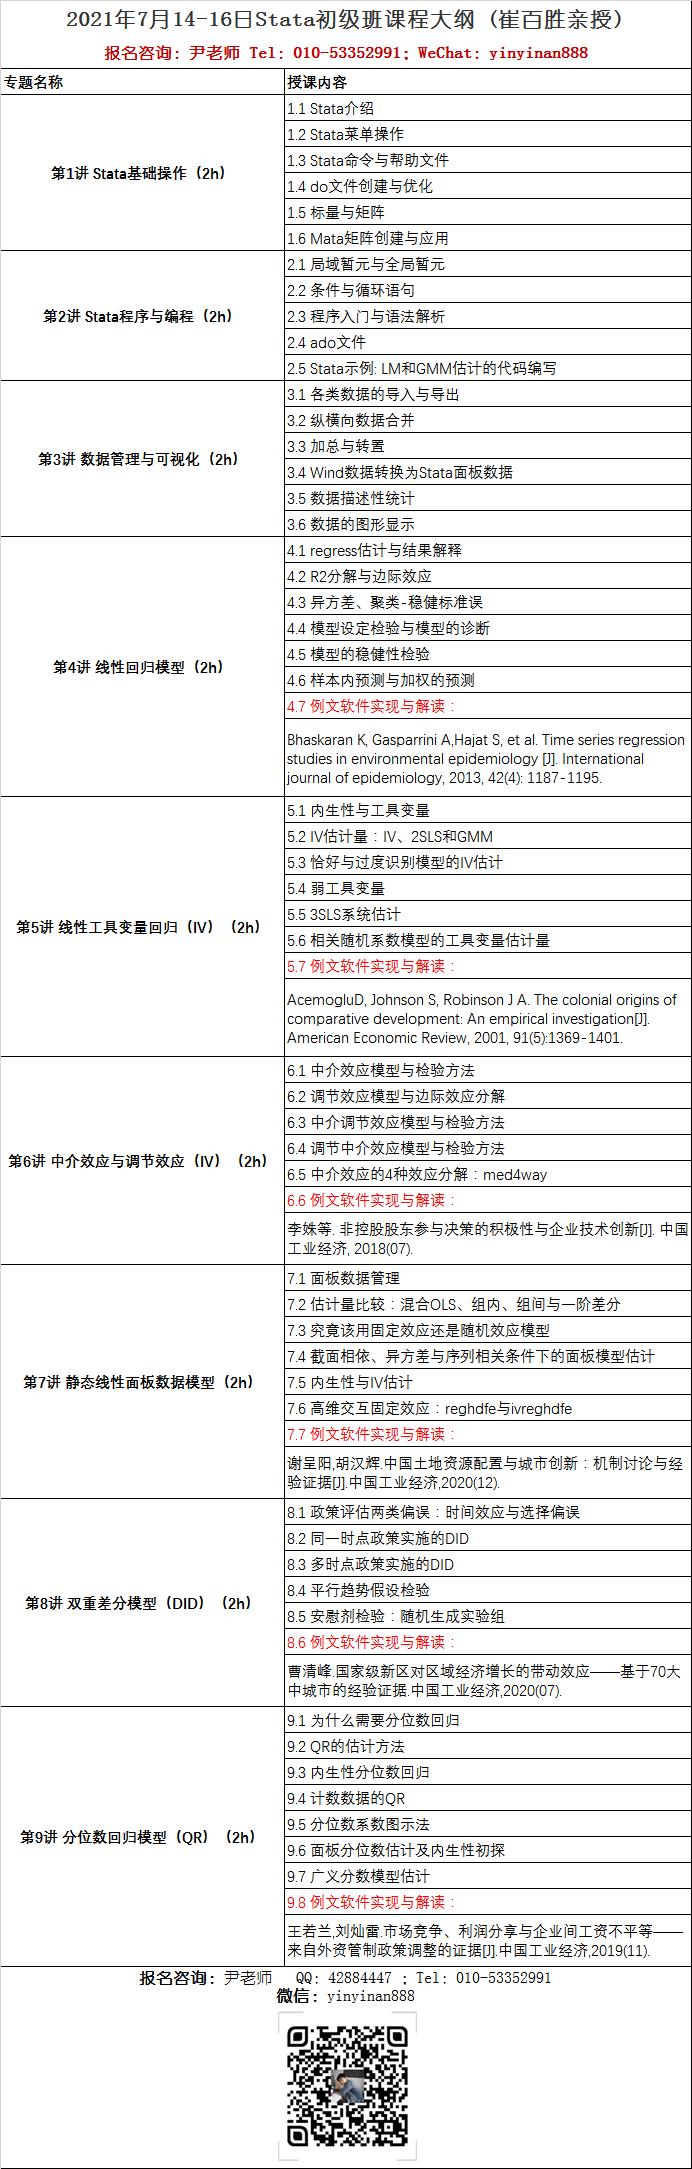 Stata初级-202107课纲.png